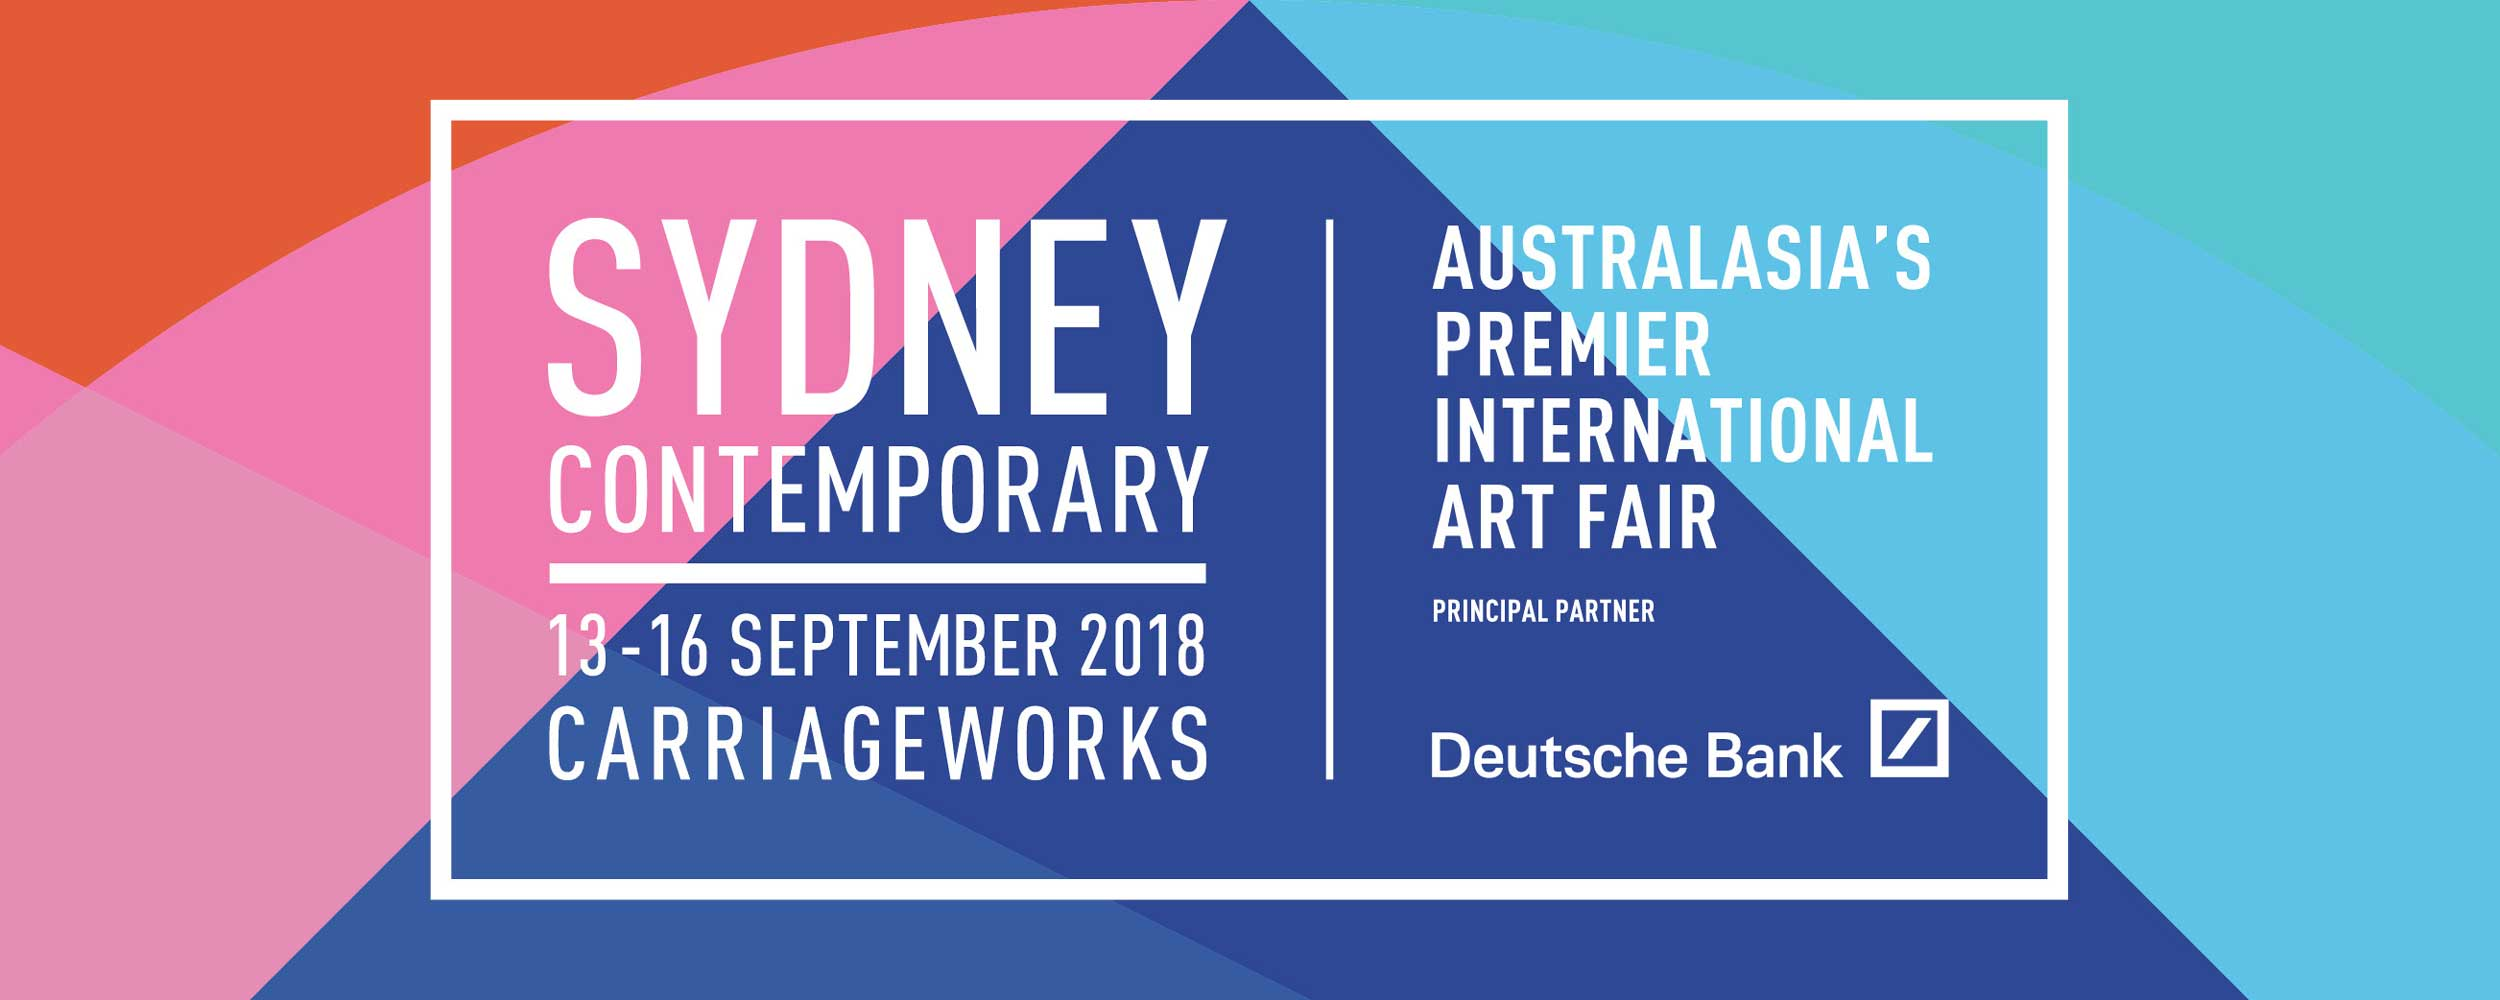 Sydney Contemporary 2018 Banner